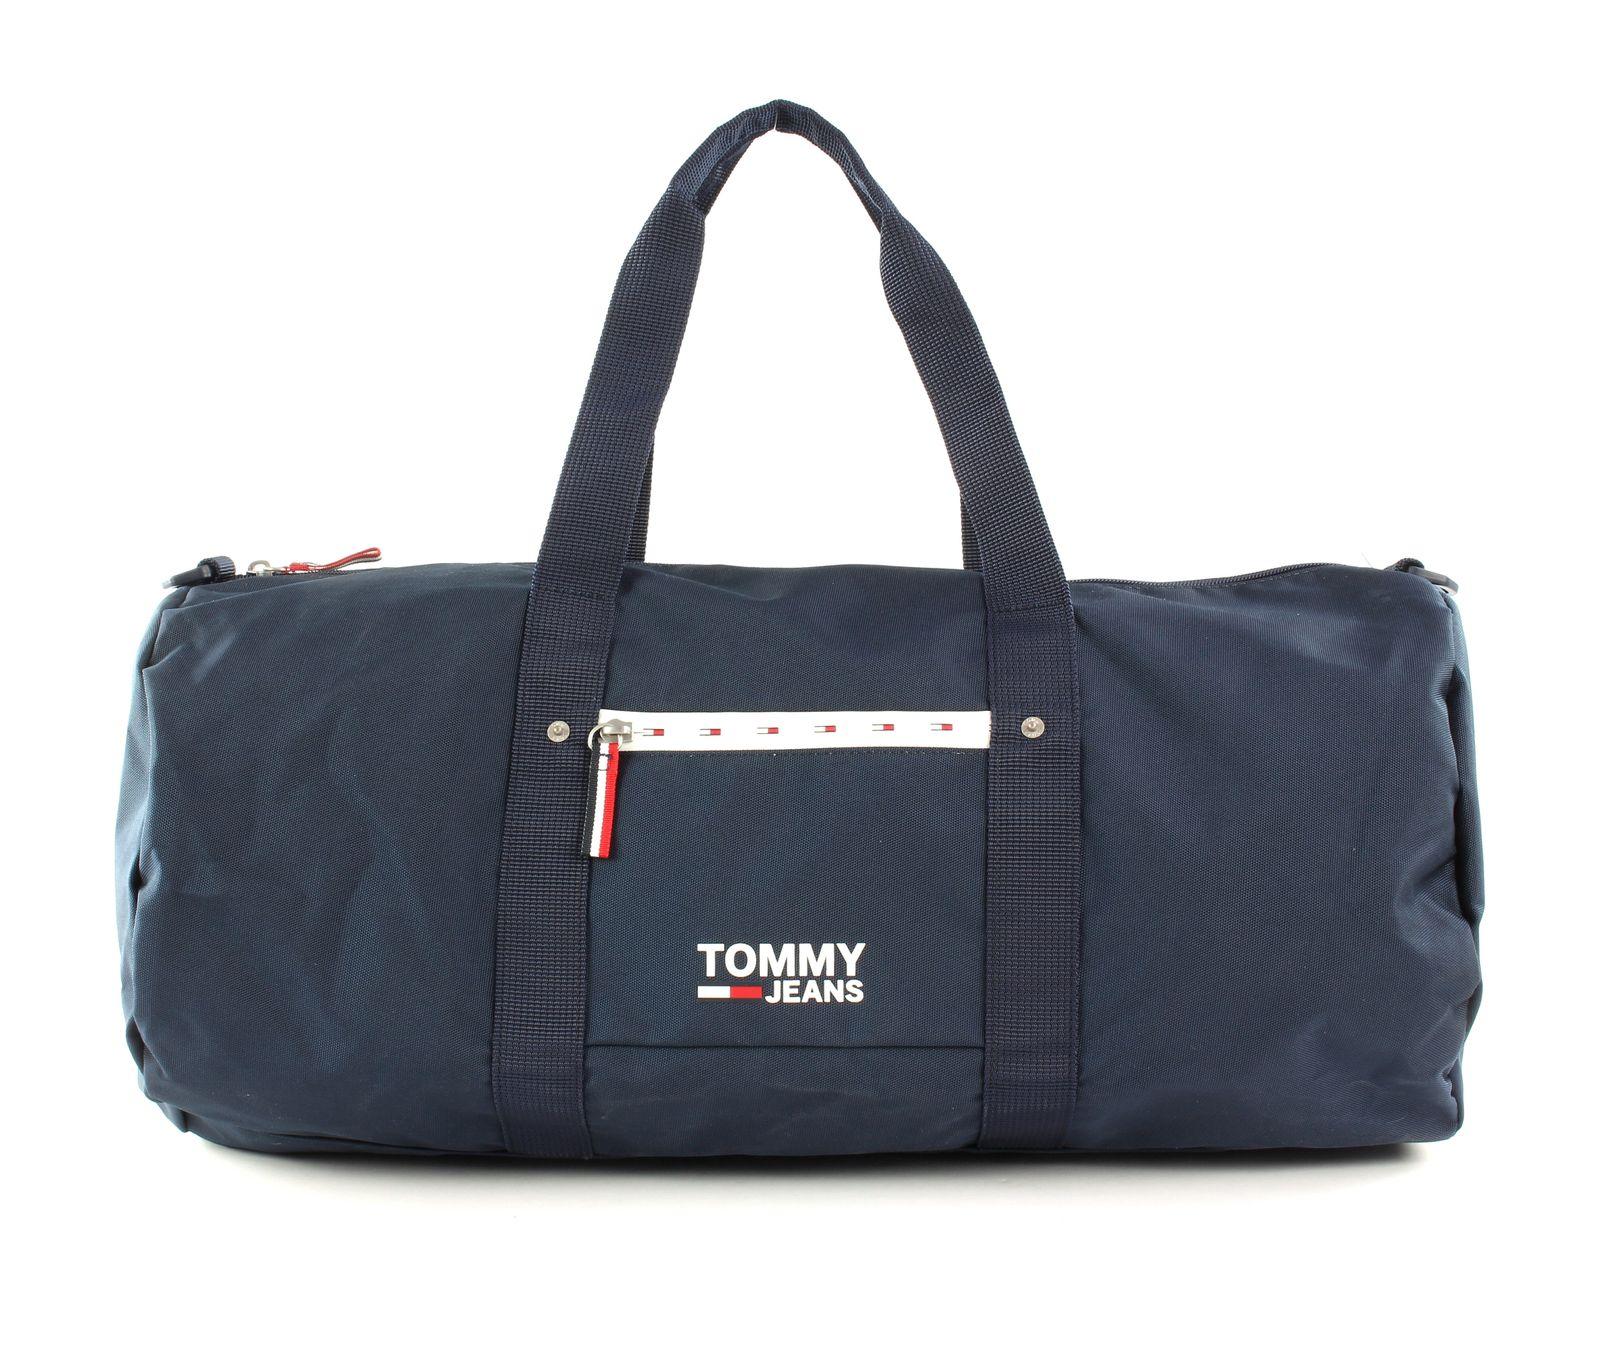 TOMMY HILFIGER sports bag City Duffle